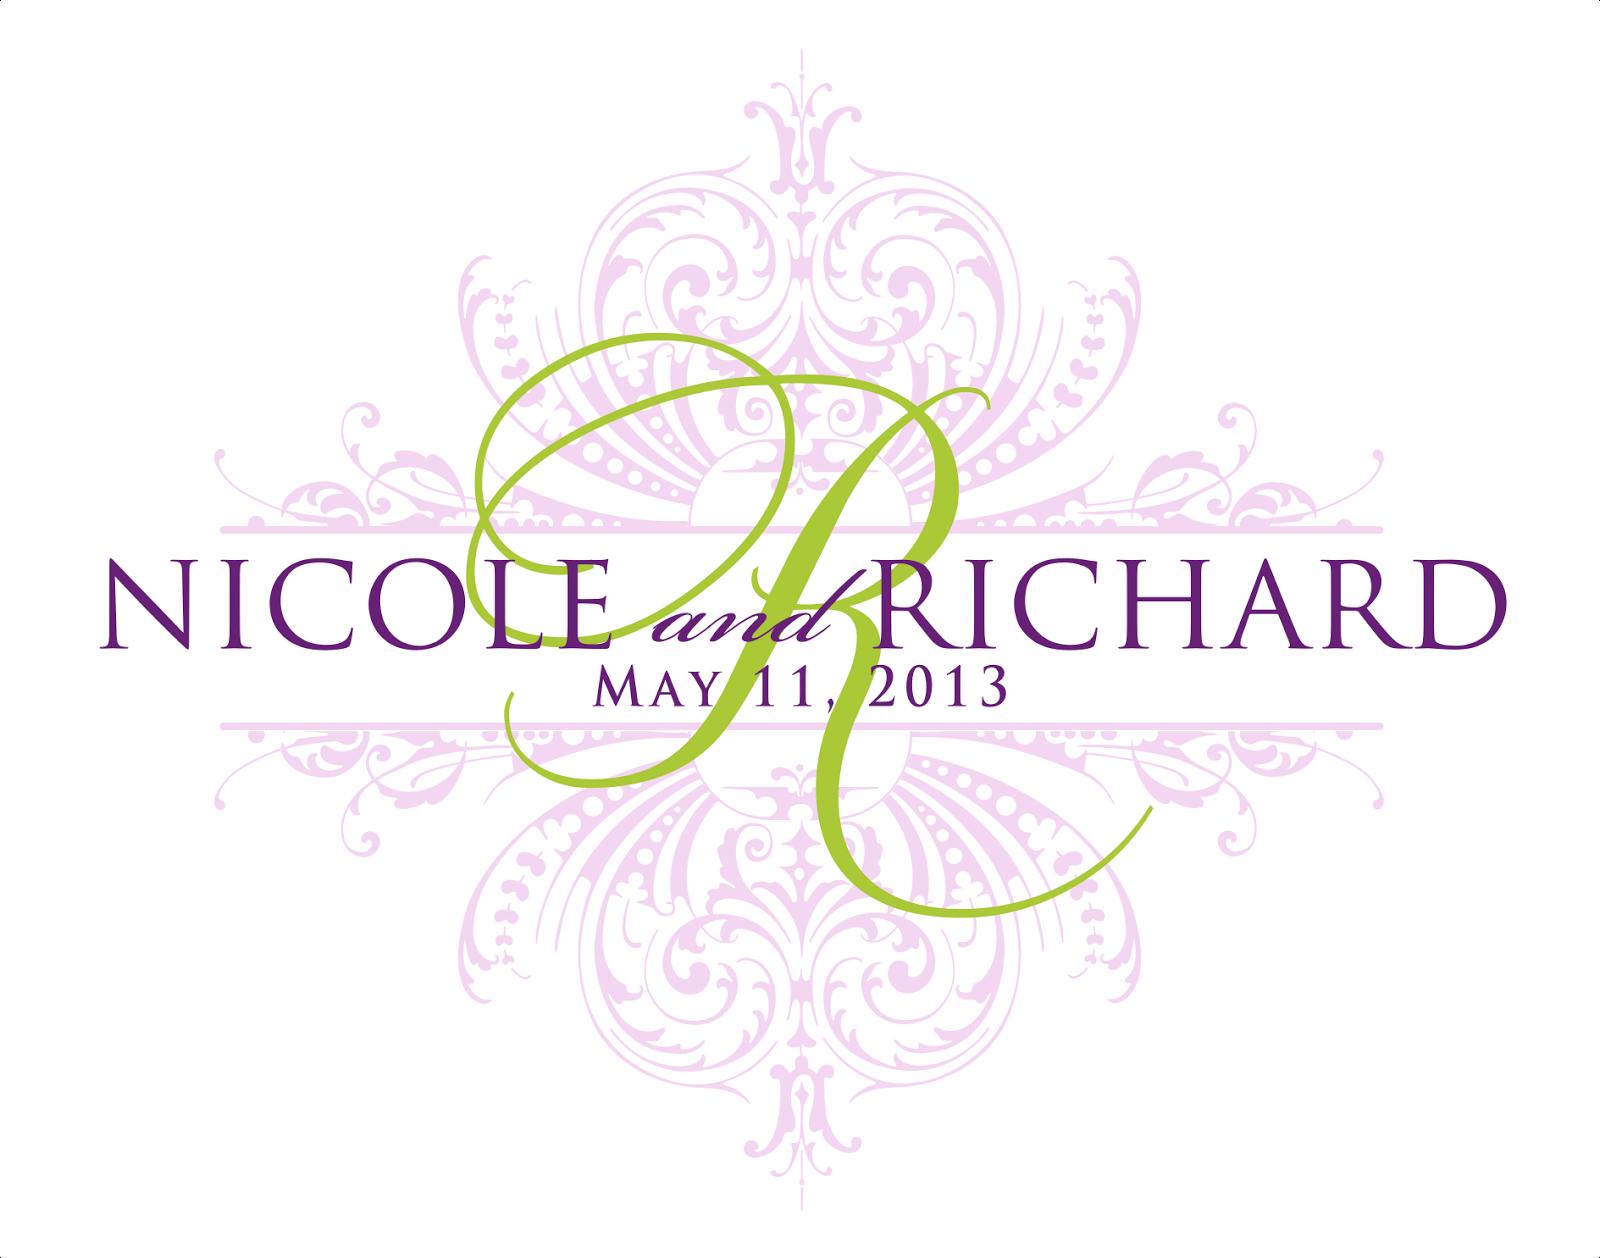 Free+Wedding+Monogram+Templates | Bridal shower | Pinterest ...